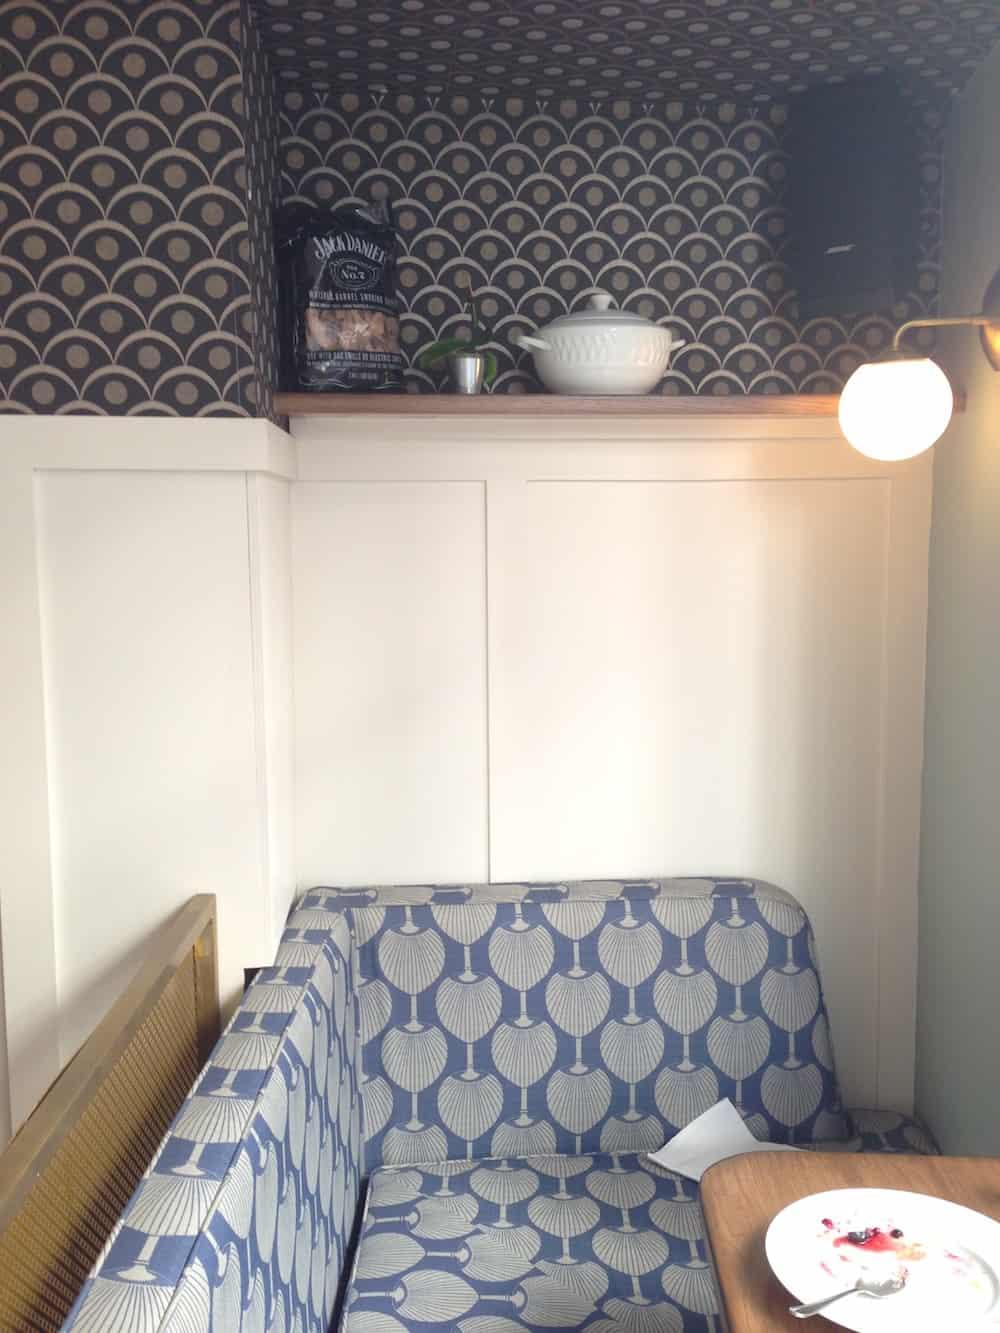 rachels-restaurant-paris-3